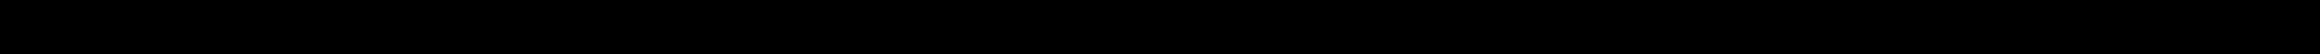 NEOLUX® P21/5W Zarovka, blikac